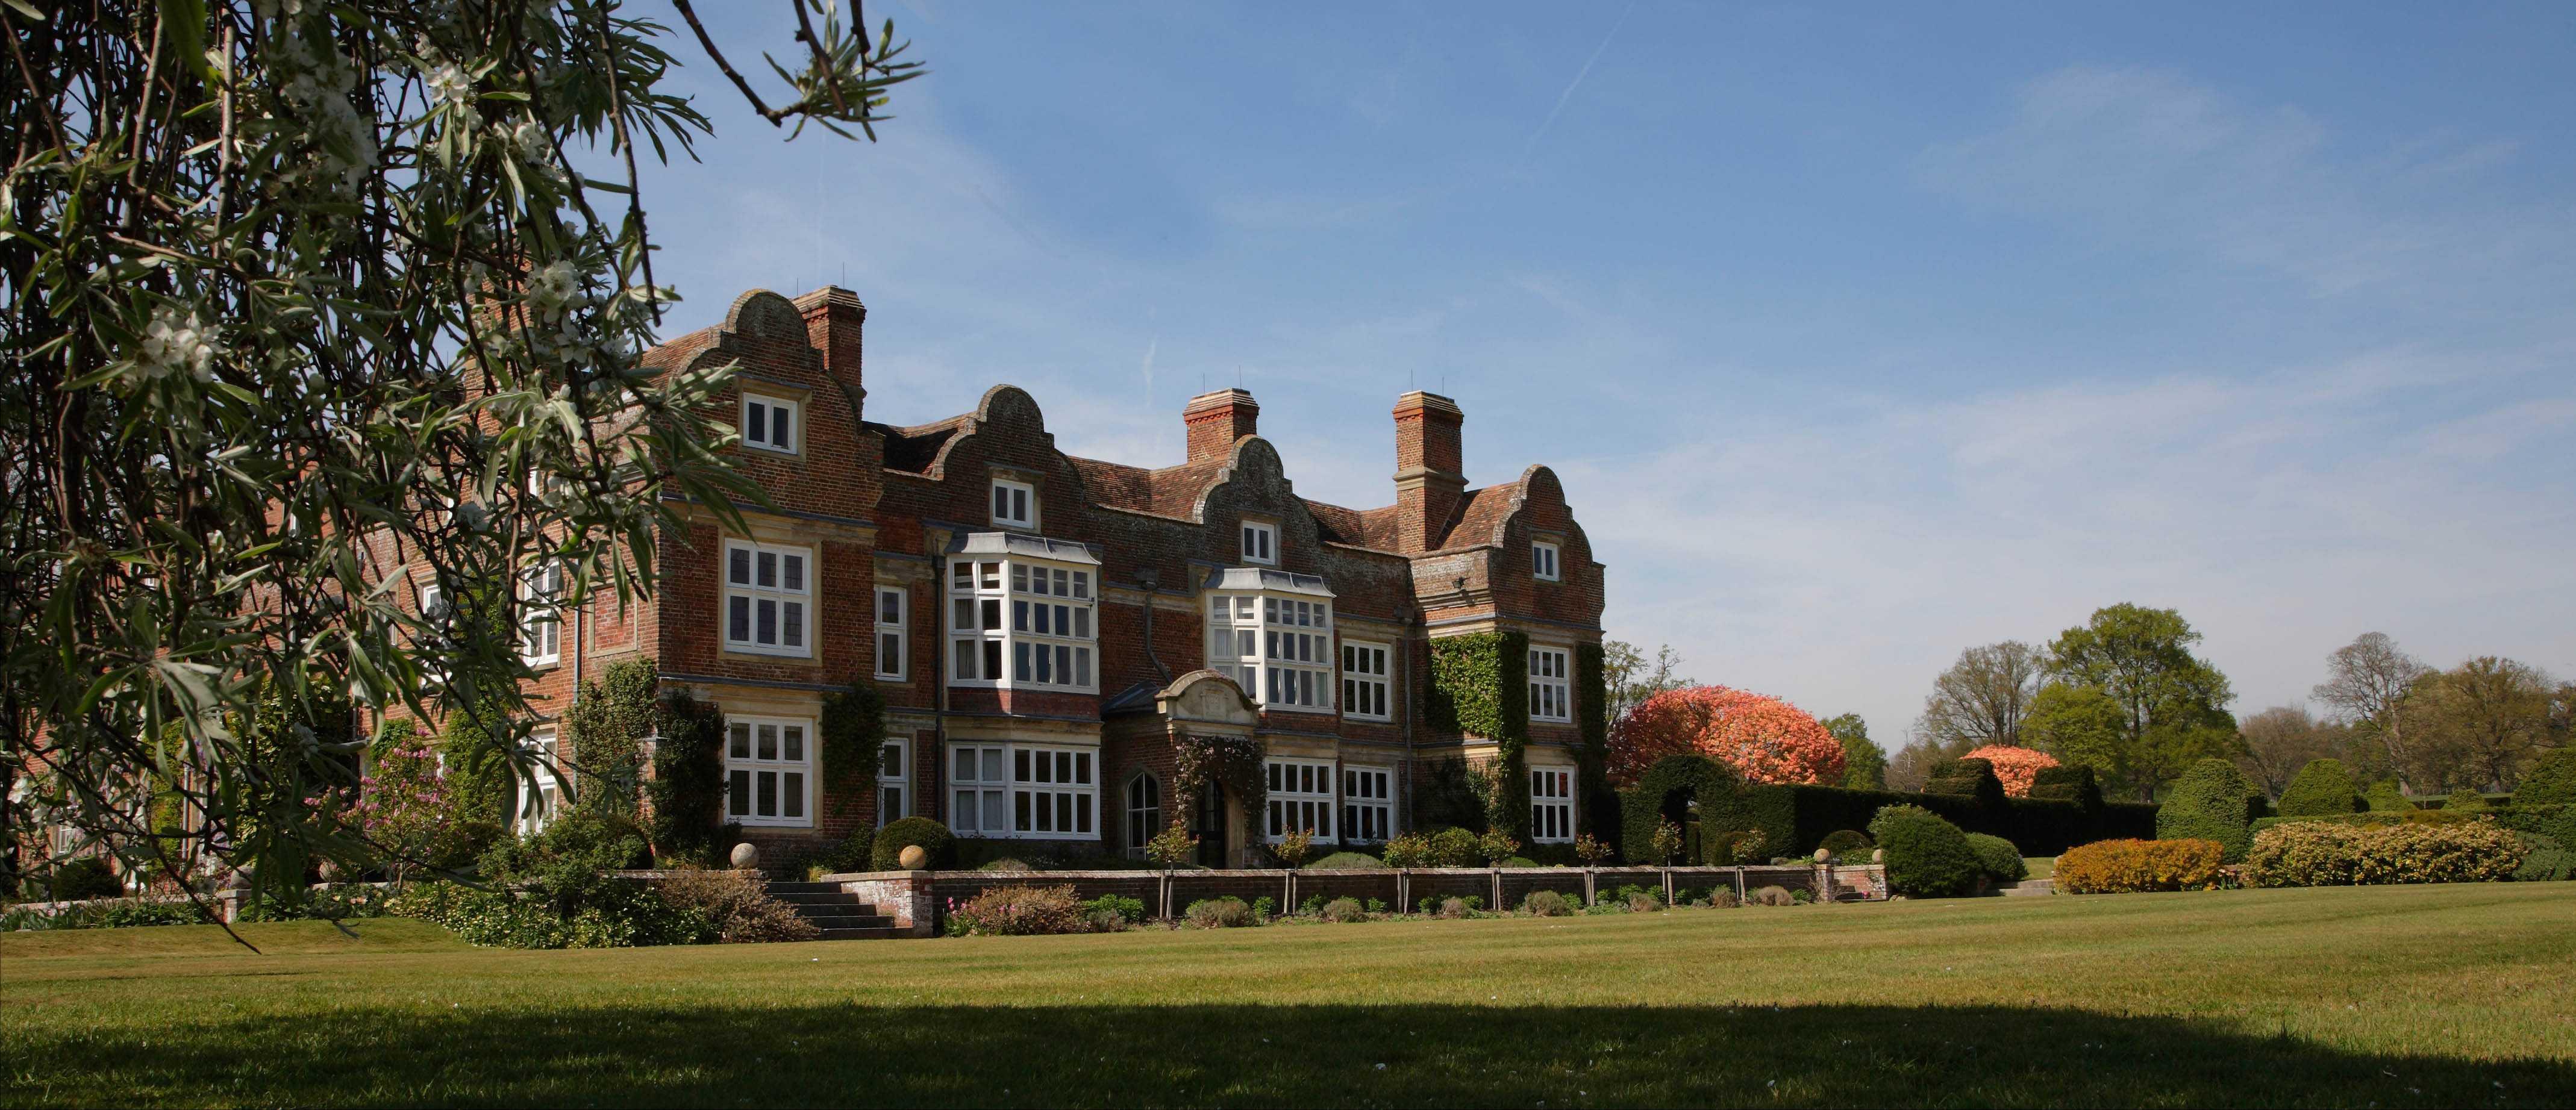 Godinton House, Kent, England